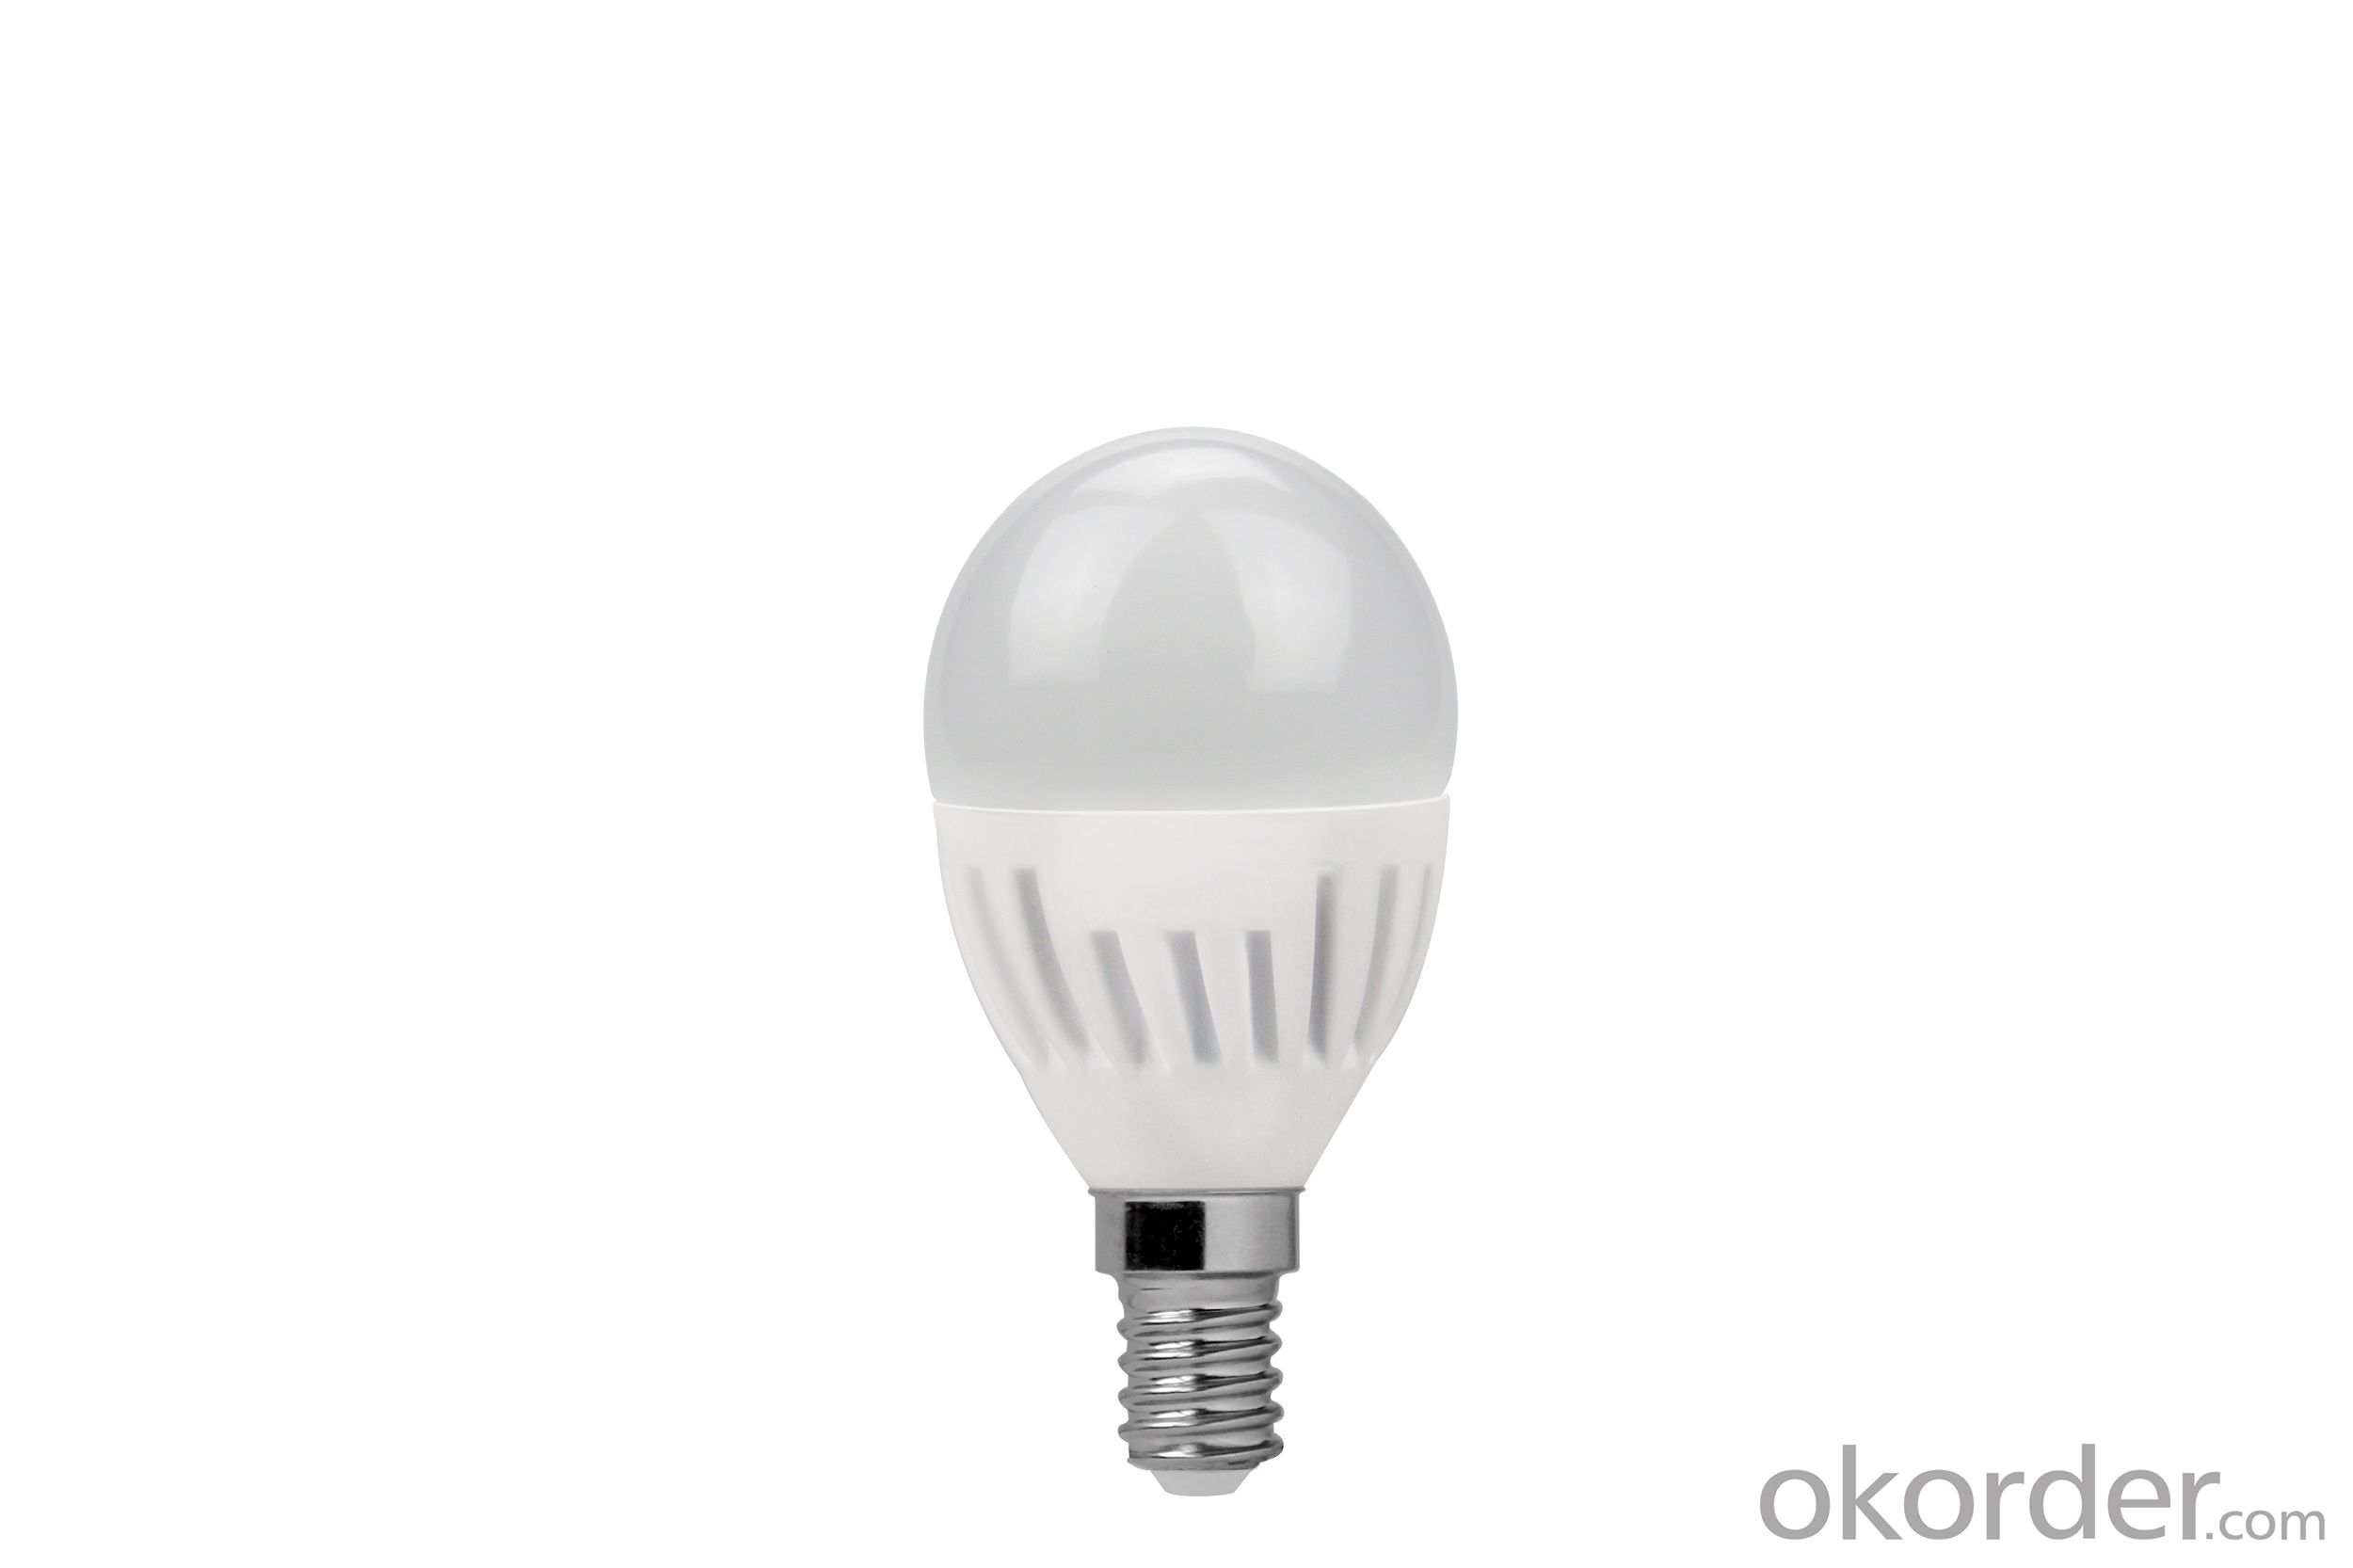 LED Bulb Light E14 P45 9W 800 Lumen Non Dimmable